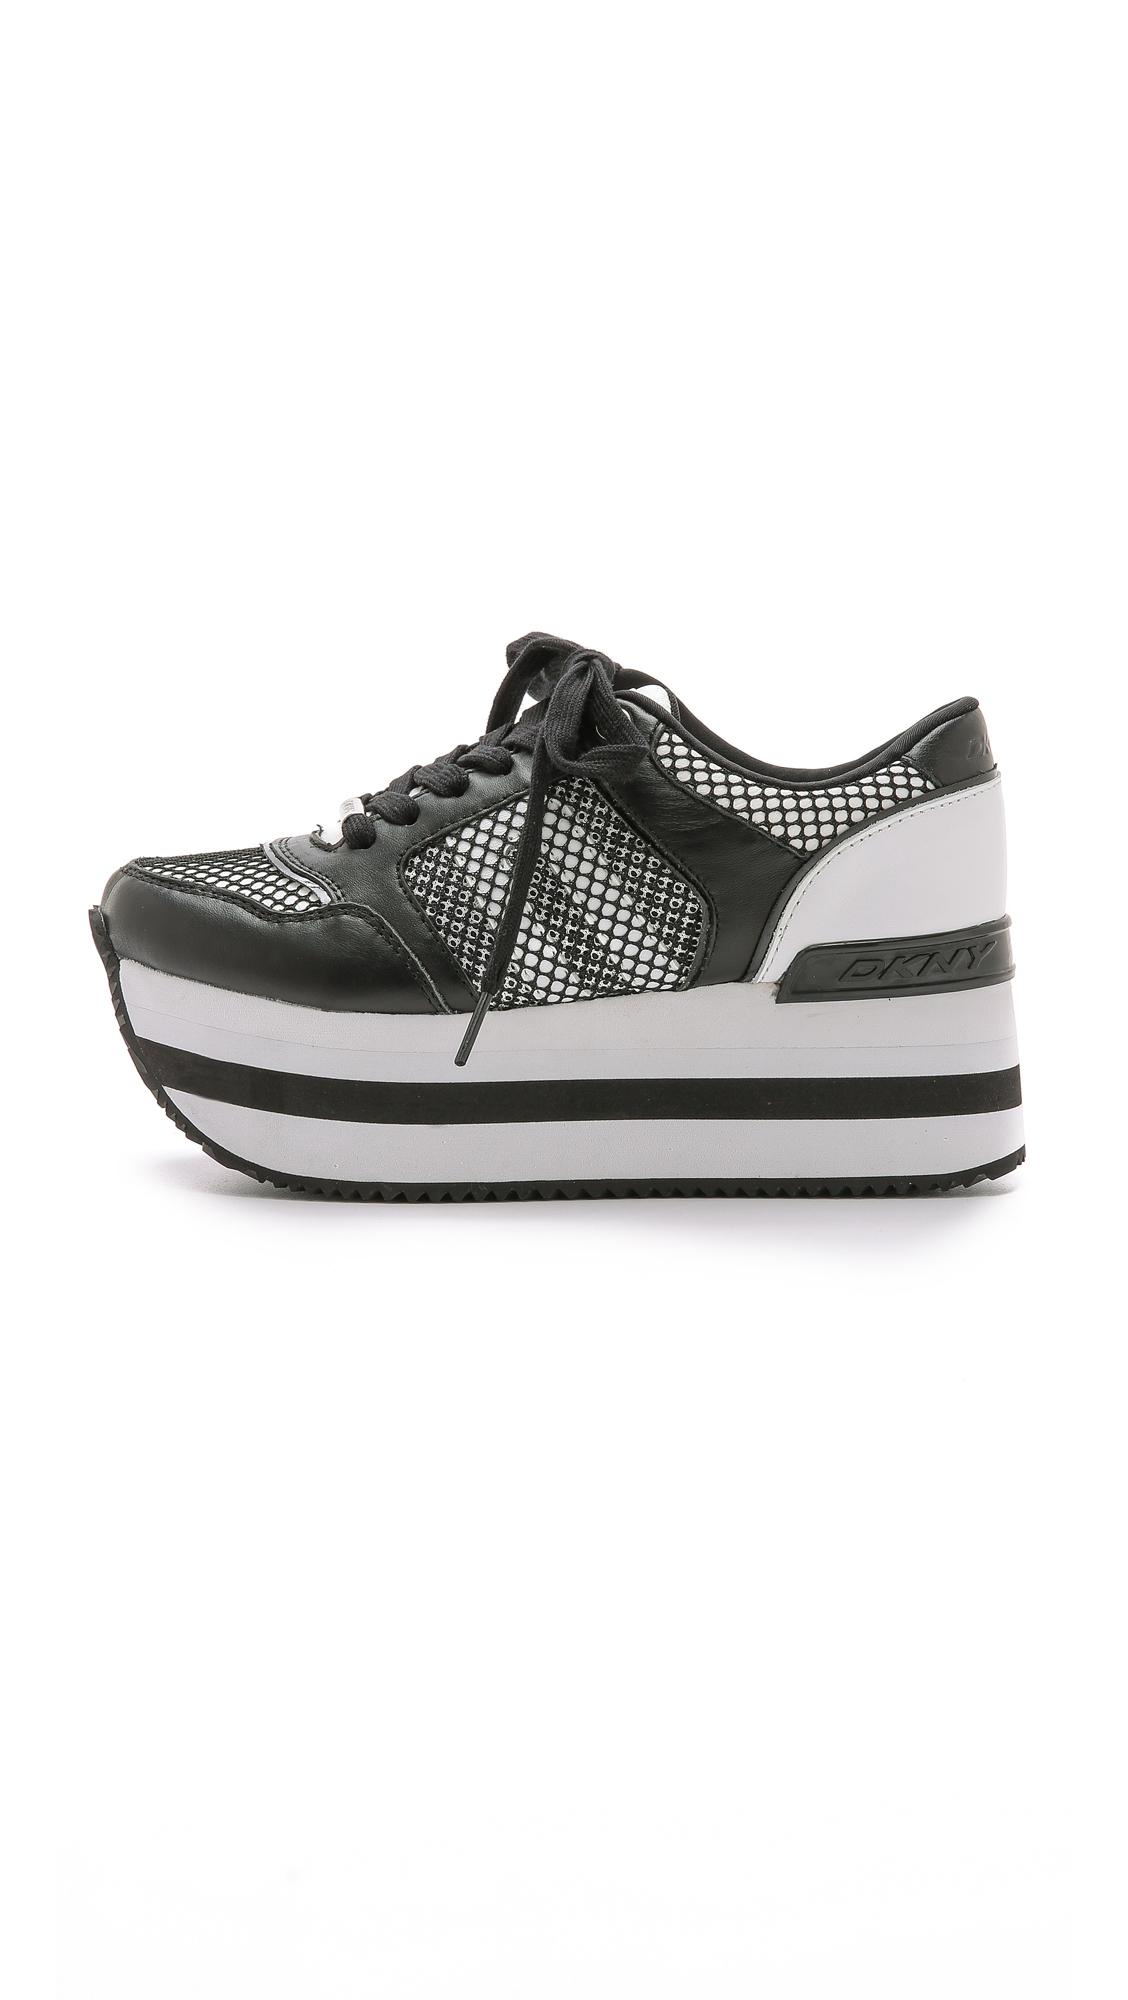 0a11f861879 Lyst - DKNY Jill Platform Sneakers - White black in White